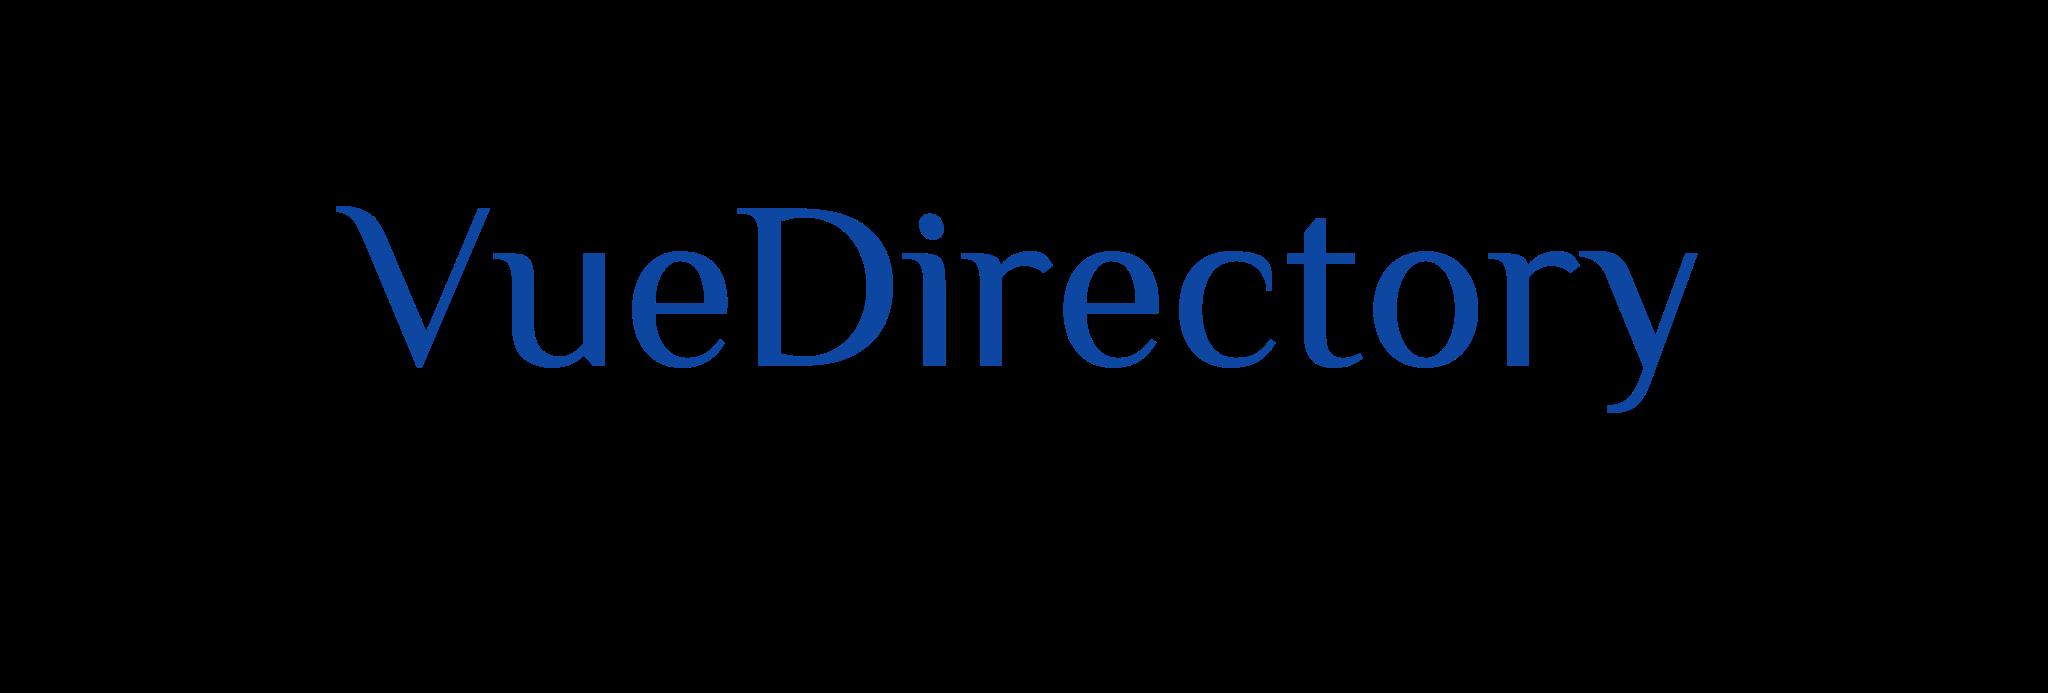 VueDirectory